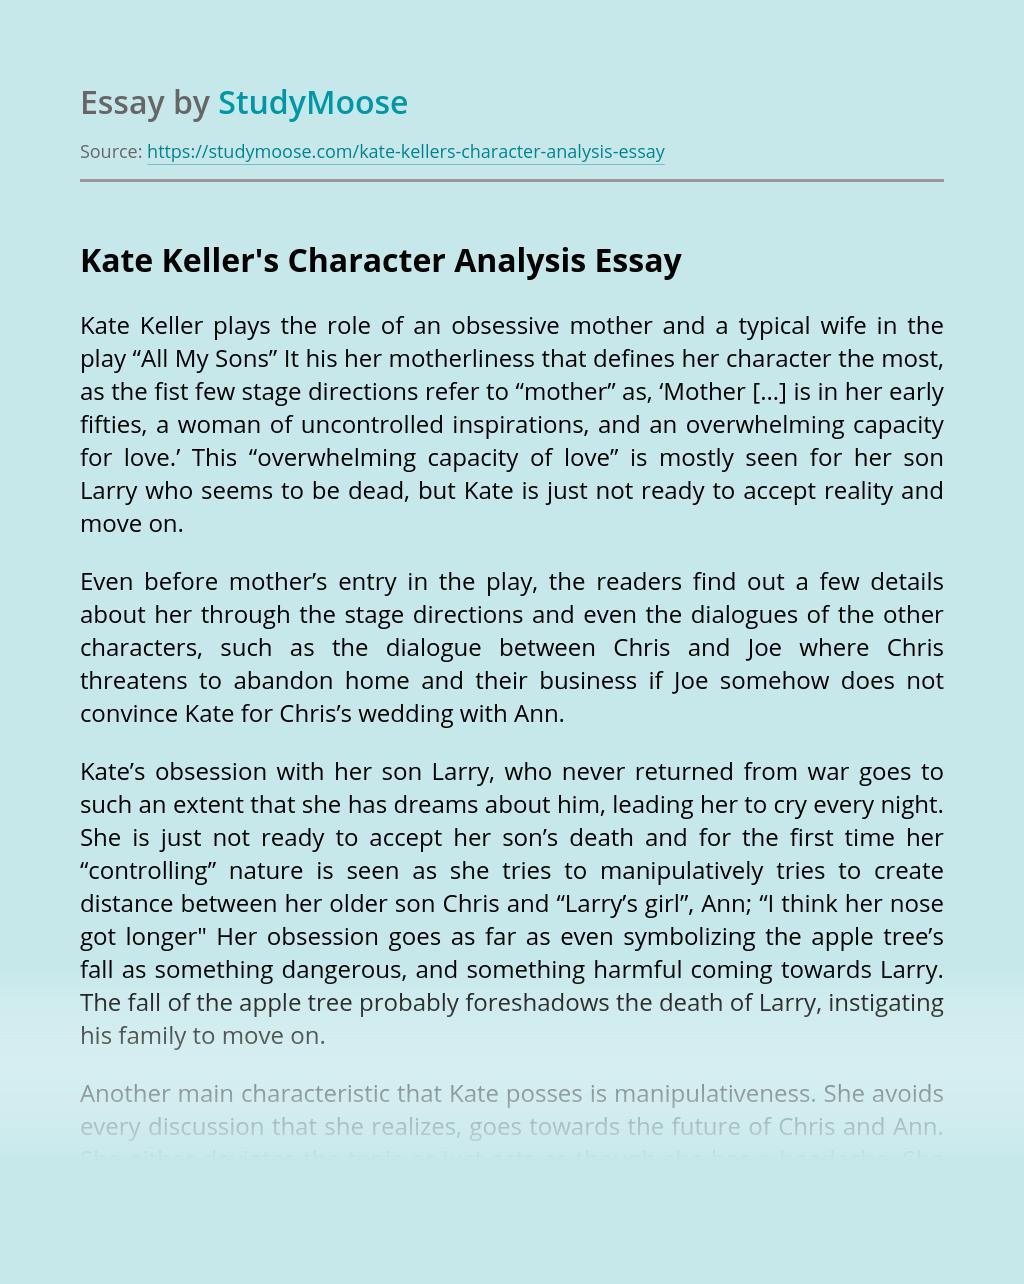 Kate Keller's Character Analysis